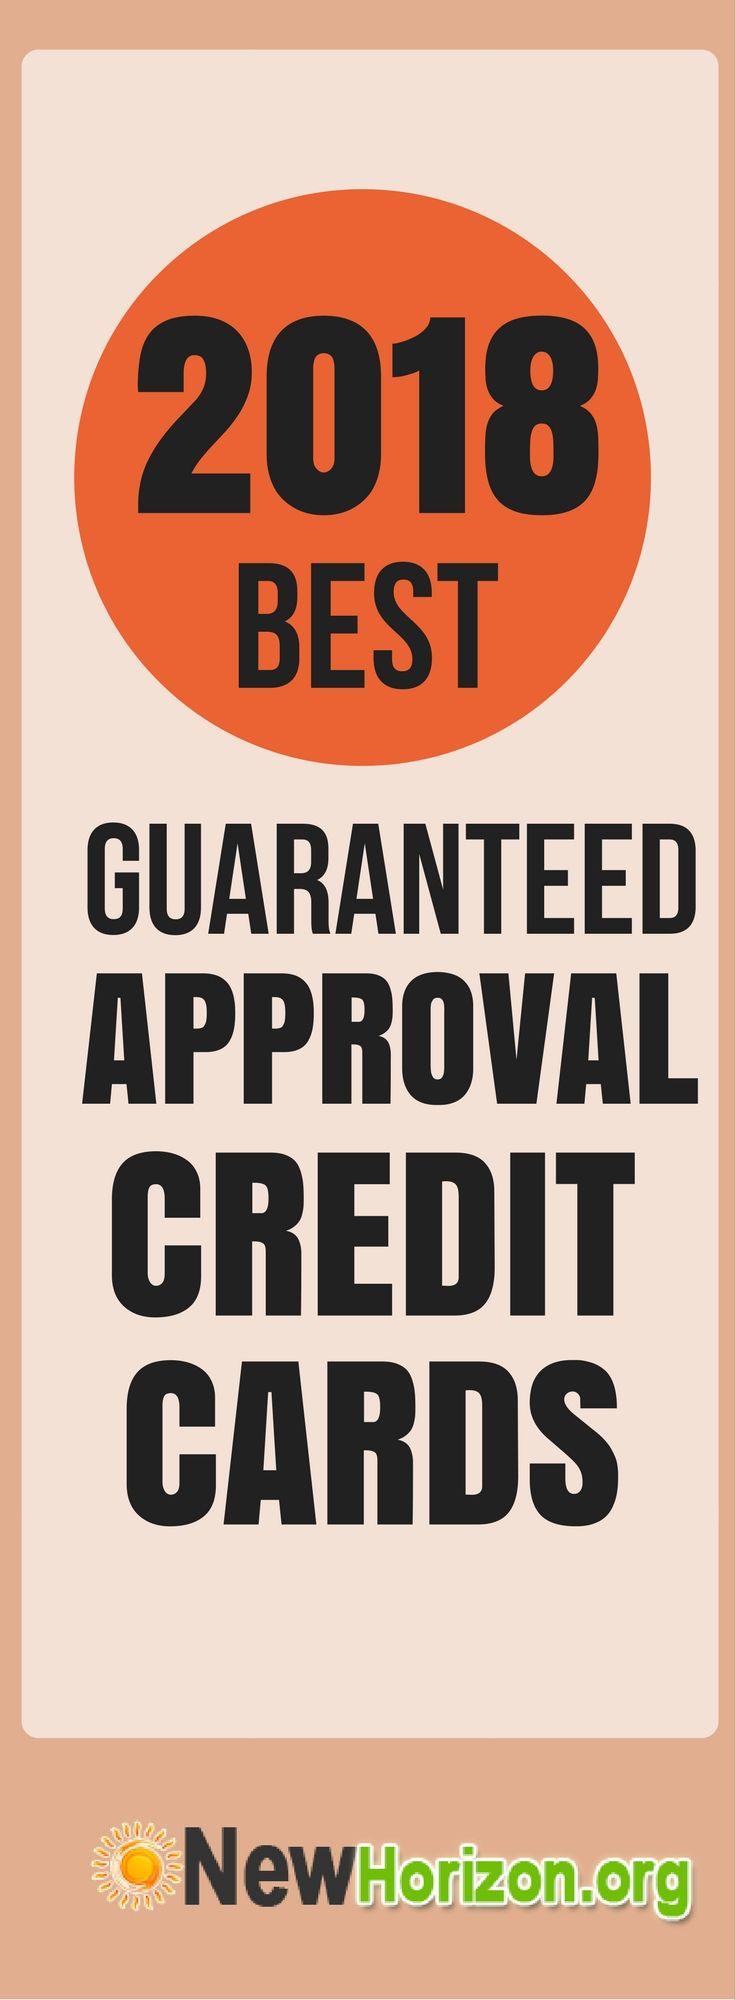 Guaranteed Approval Cards Bad Credit No Credit O K Credit Card Debt Payoff Secure Credit Card Paying Off Credit Cards